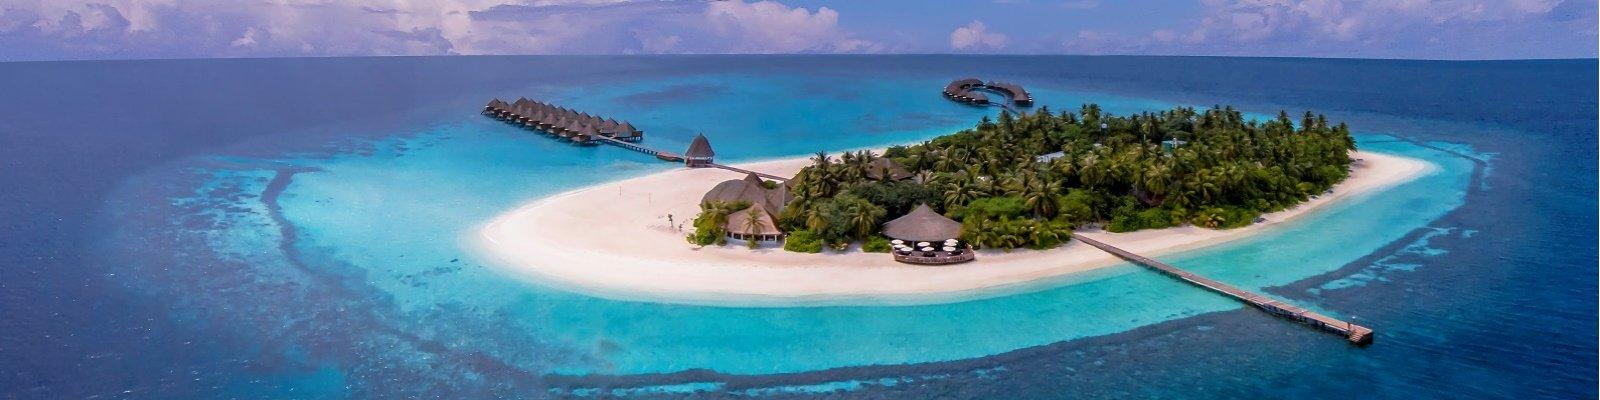 Malediven Infos